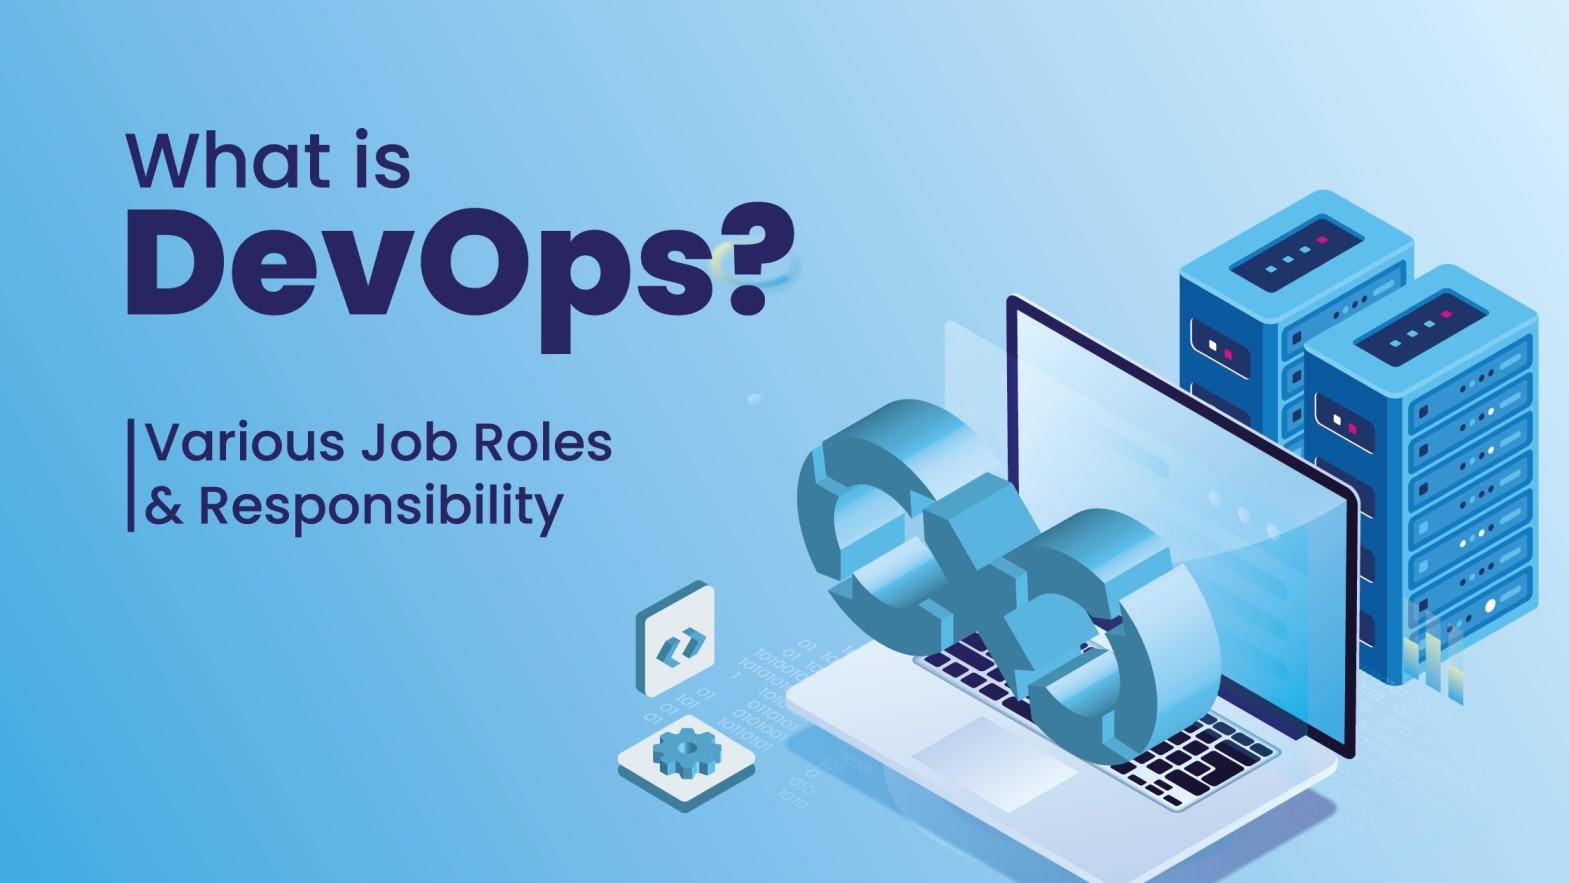 What is DevOps? Various DevOps Job Roles and Responsibilities